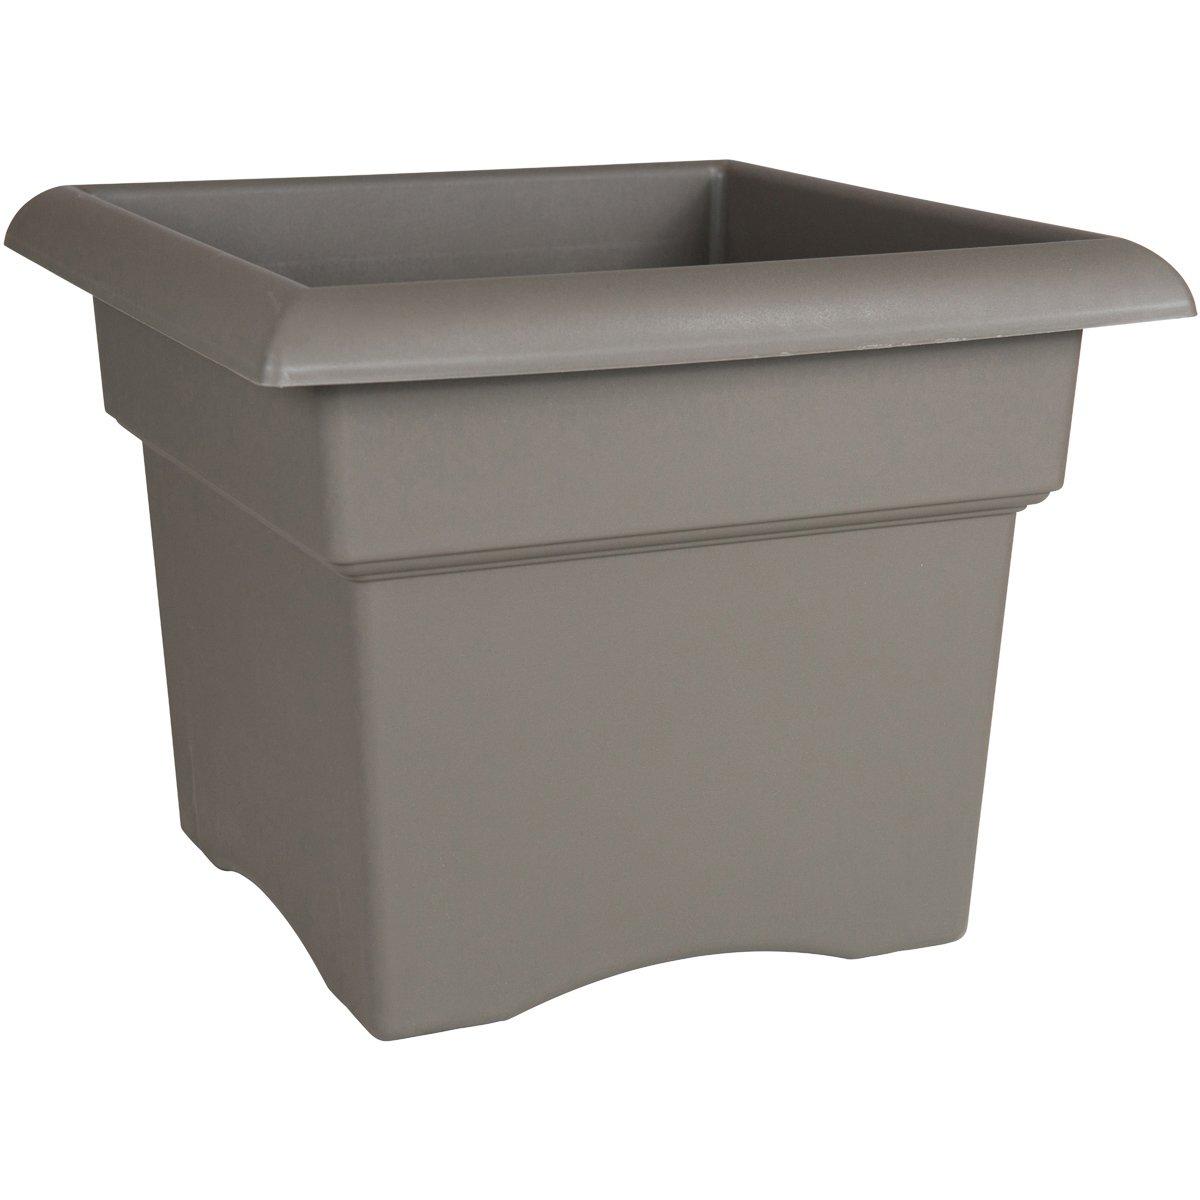 Bloem Fiskars 14 Inch Veranda 3 Gallon Box Planter, Color Cement (57714), 14-Inch